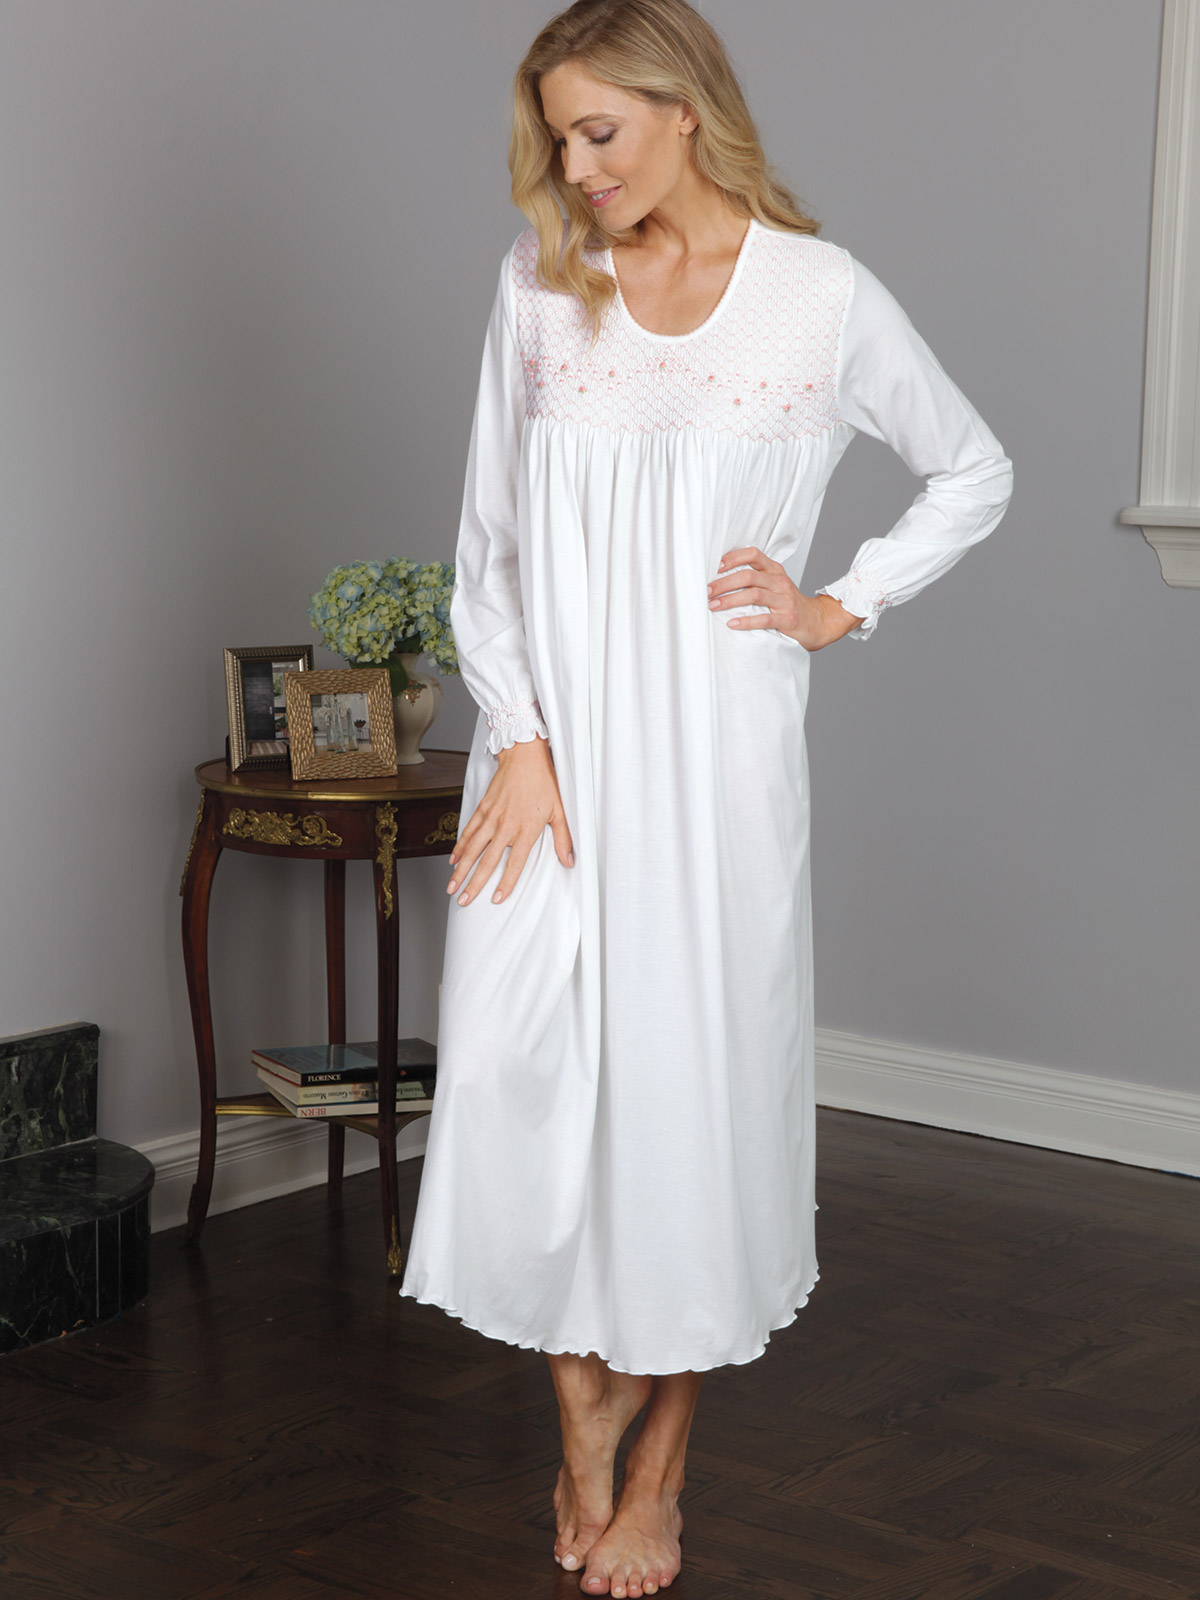 94c5118835 Jackie - Luxury Nightwear - Schweitzer Linen